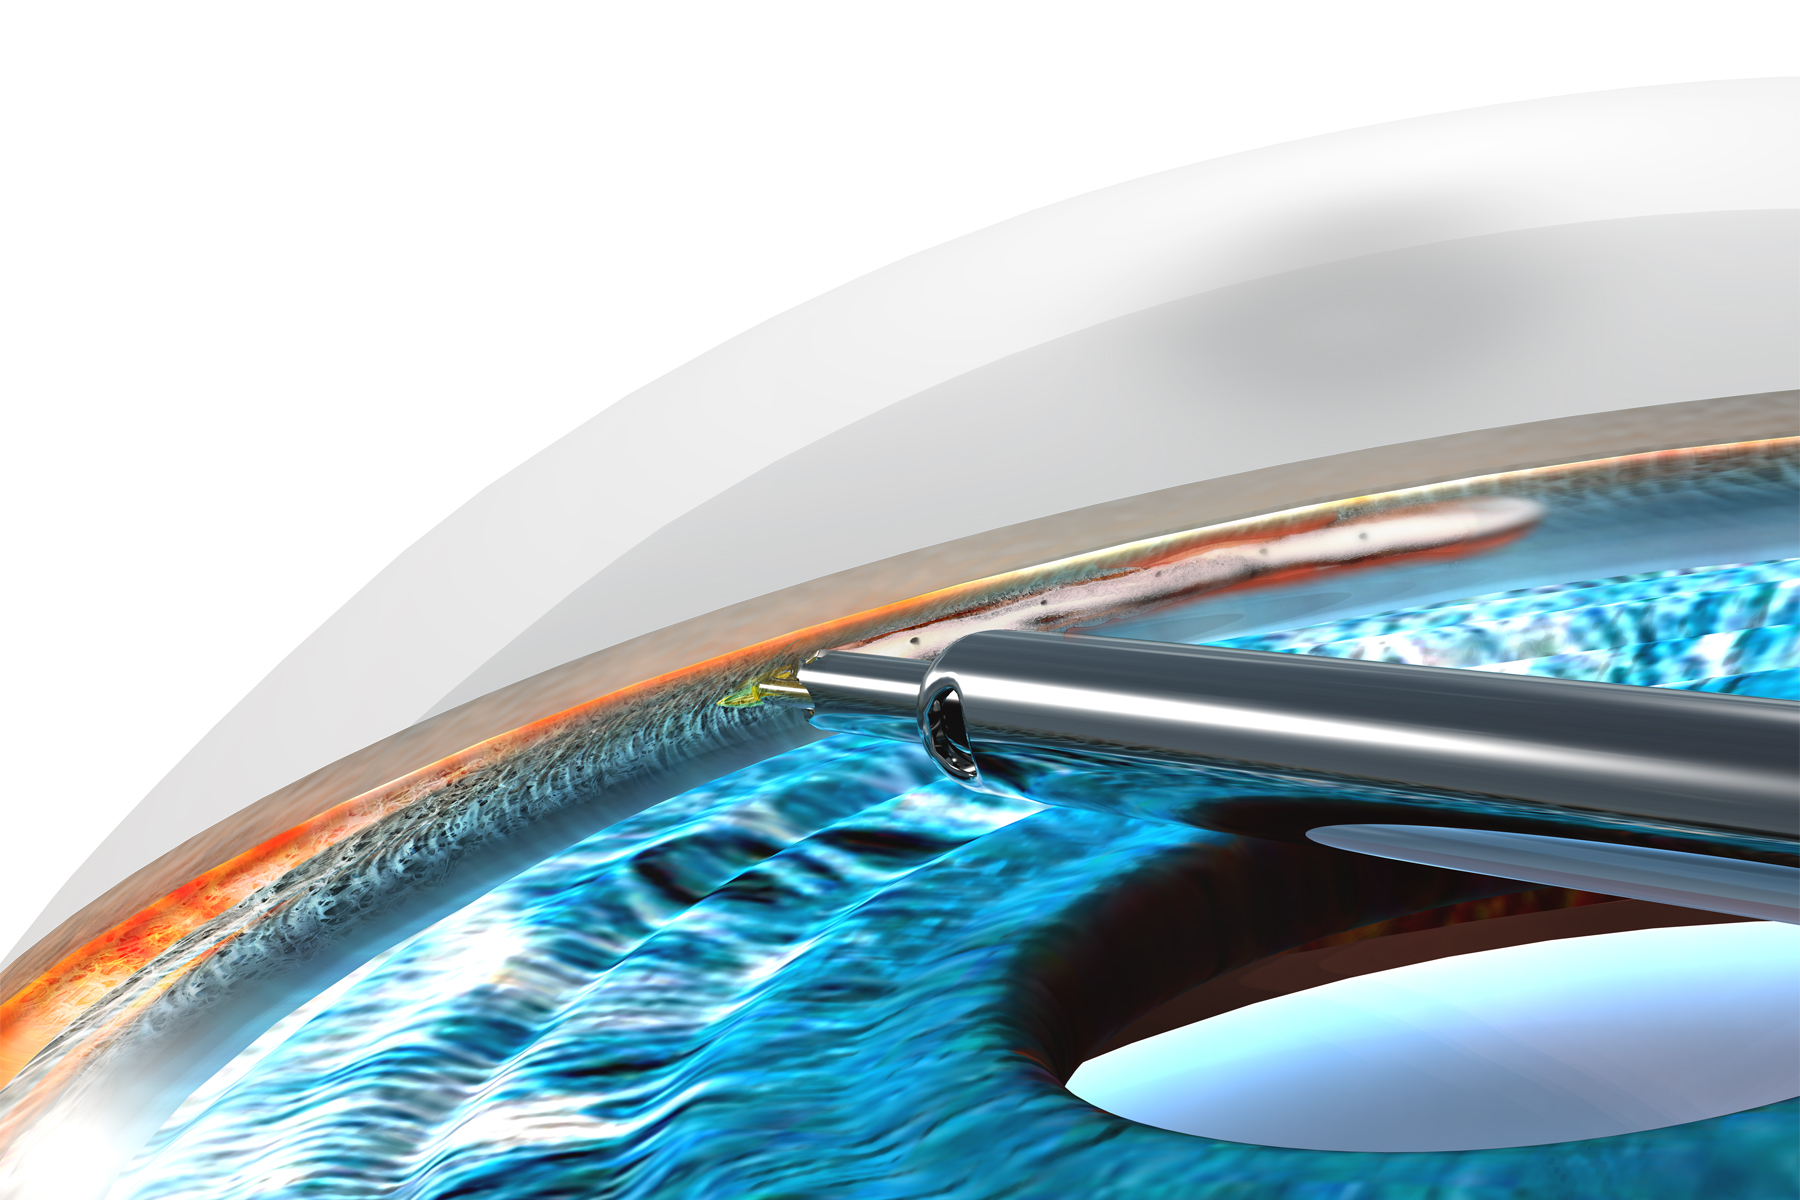 Trabectome-Handpiece-Tip-3D